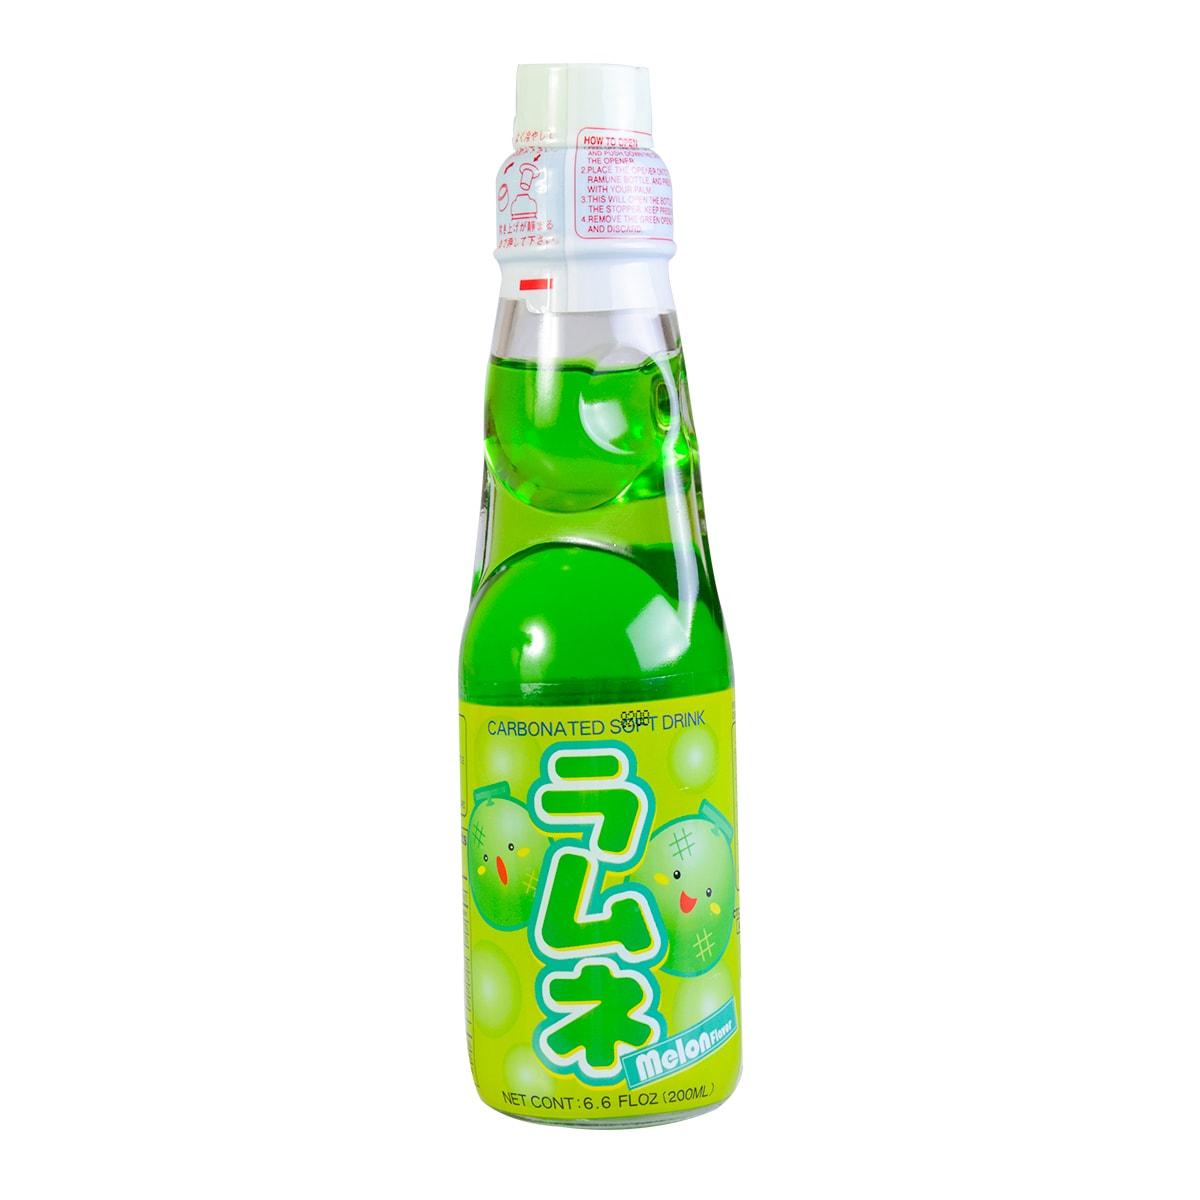 日本HATA RAMUNE 甜瓜味弹珠汽水 200ml